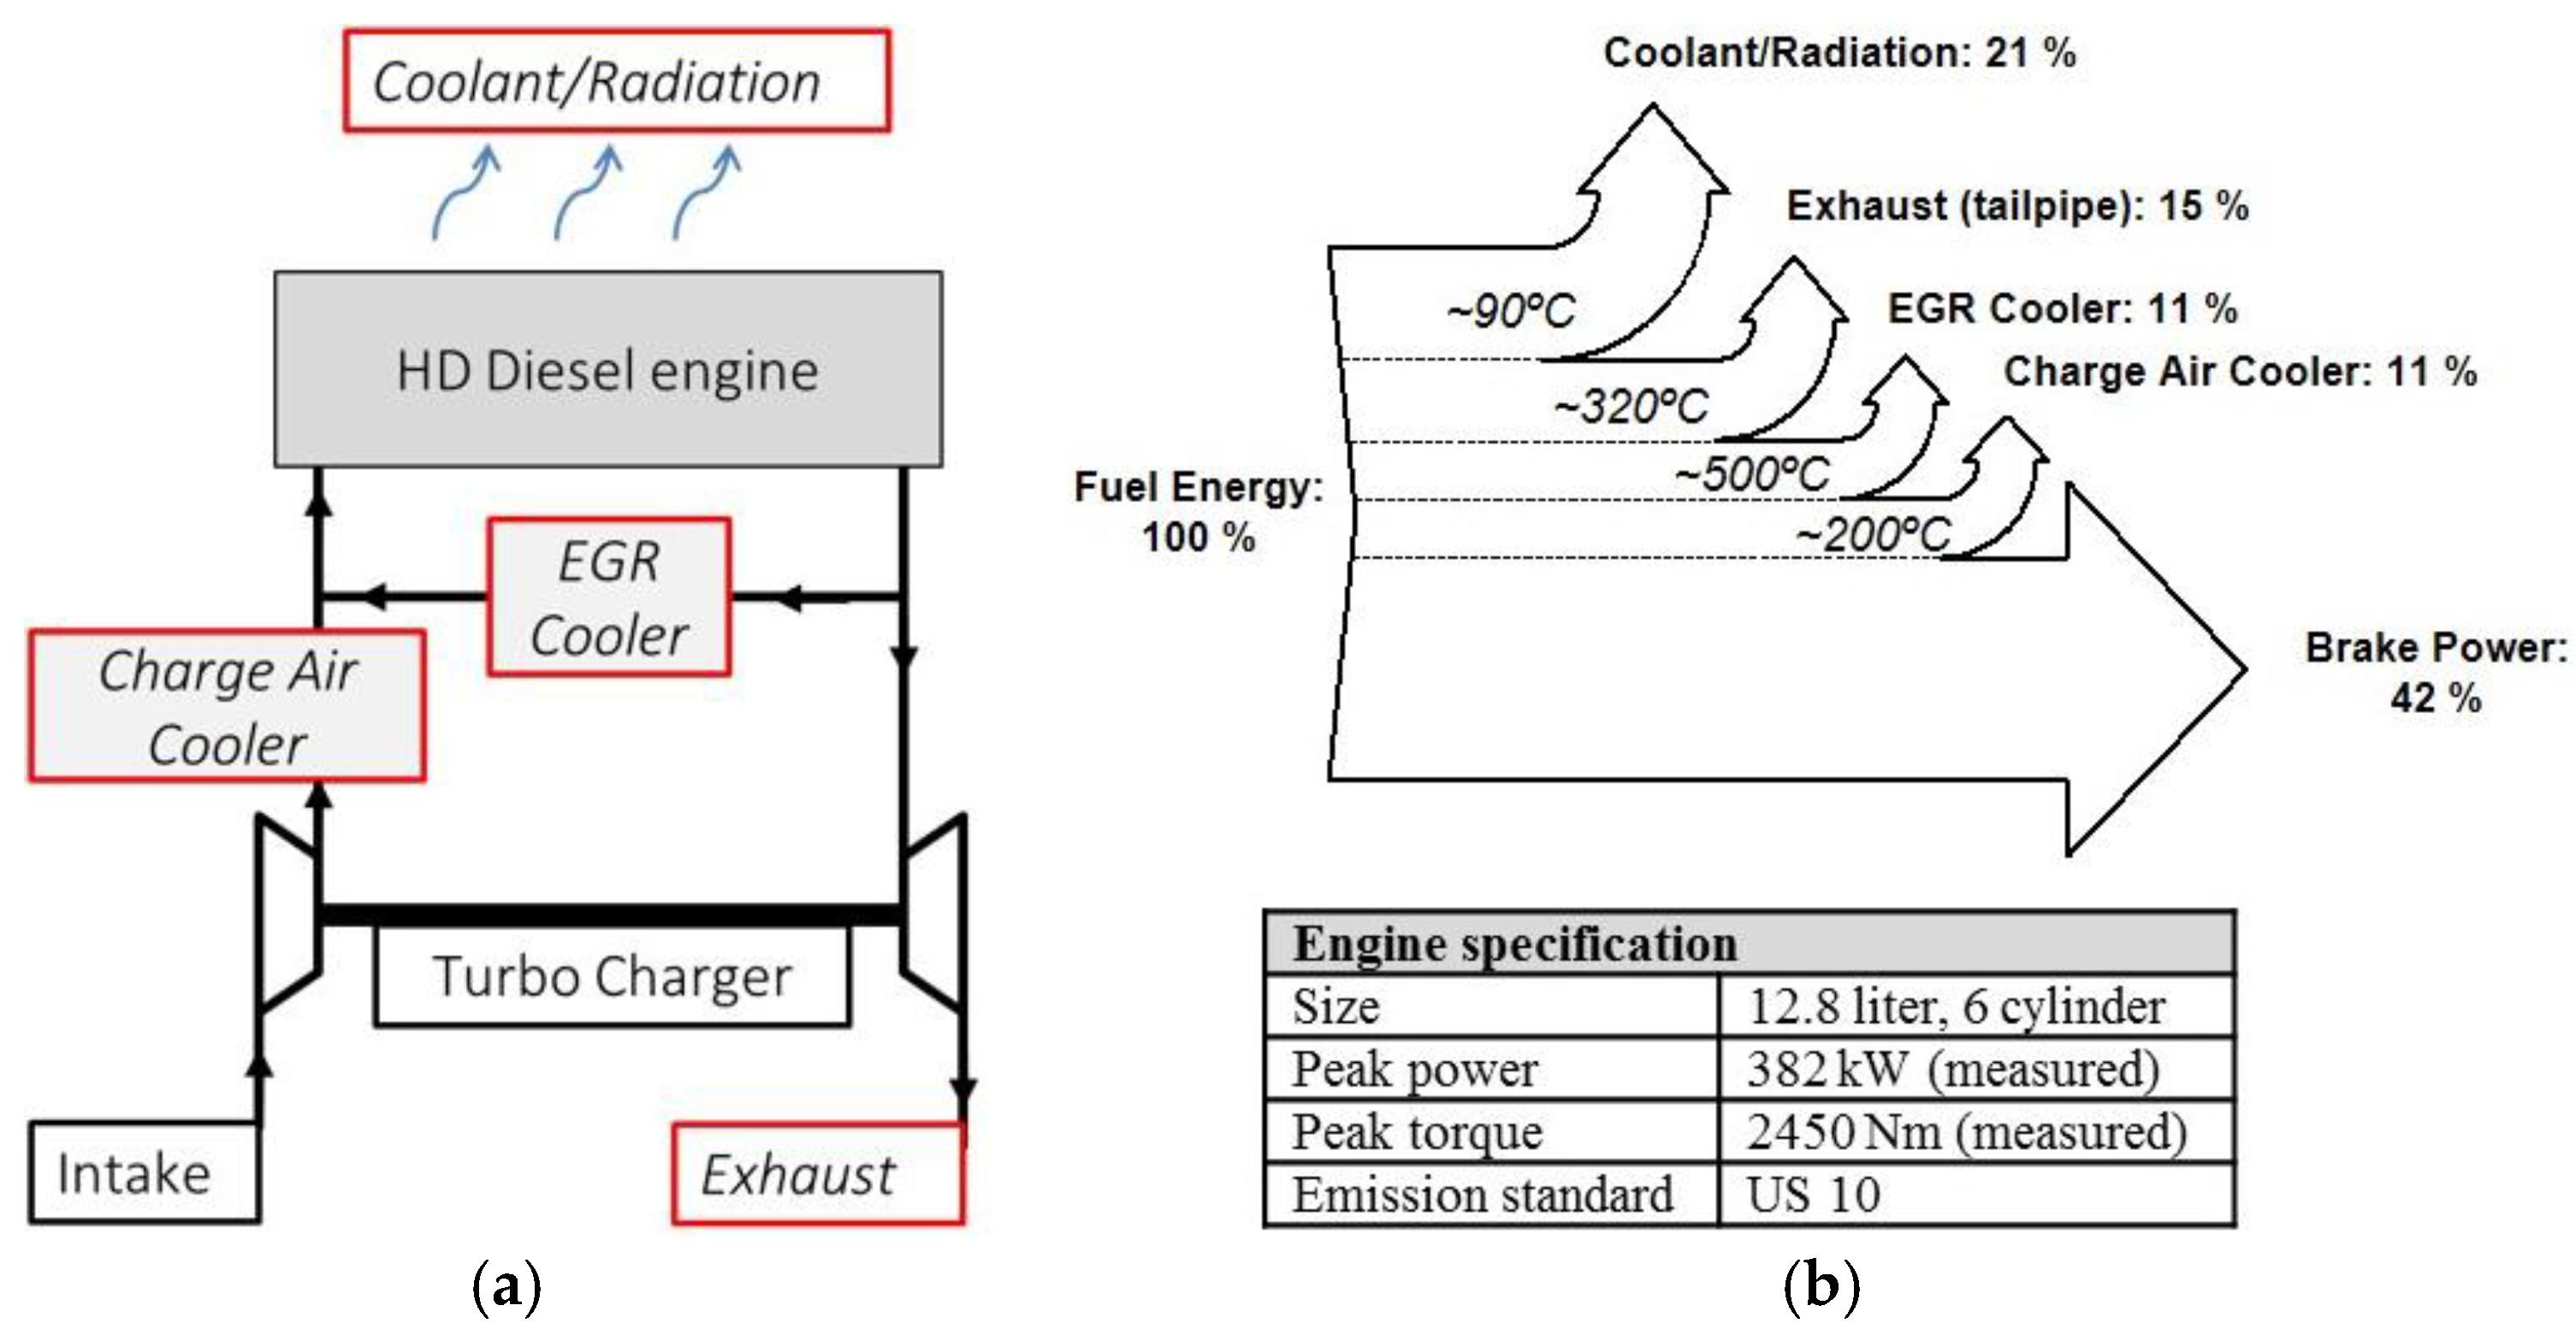 1 Cylinder Engine Diagram Energies Free Full Text Of 1 Cylinder Engine Diagram